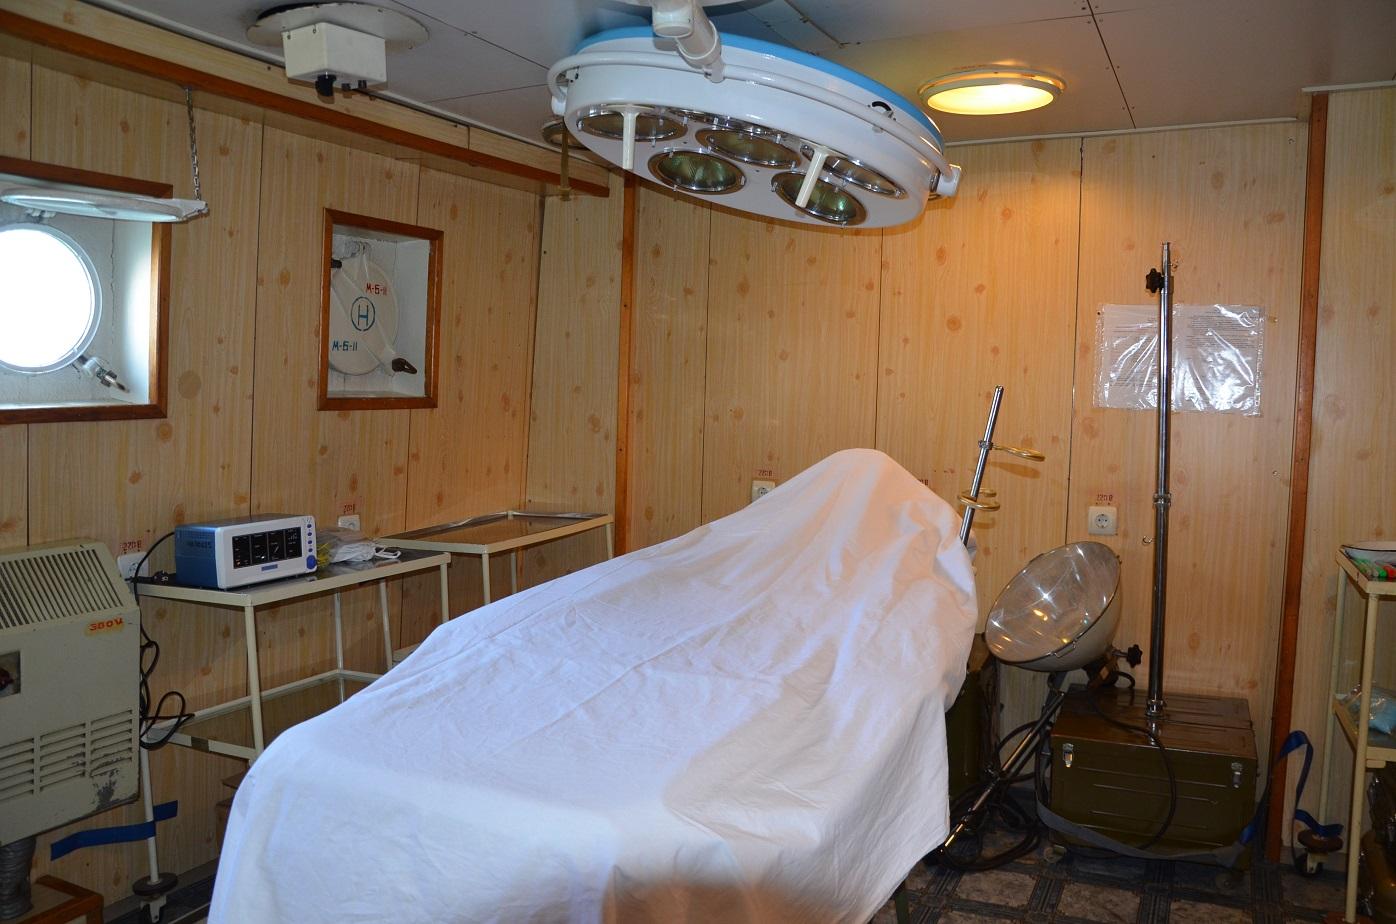 Санітарний катер ВМСУ Сокаль готовий до COIVID-19